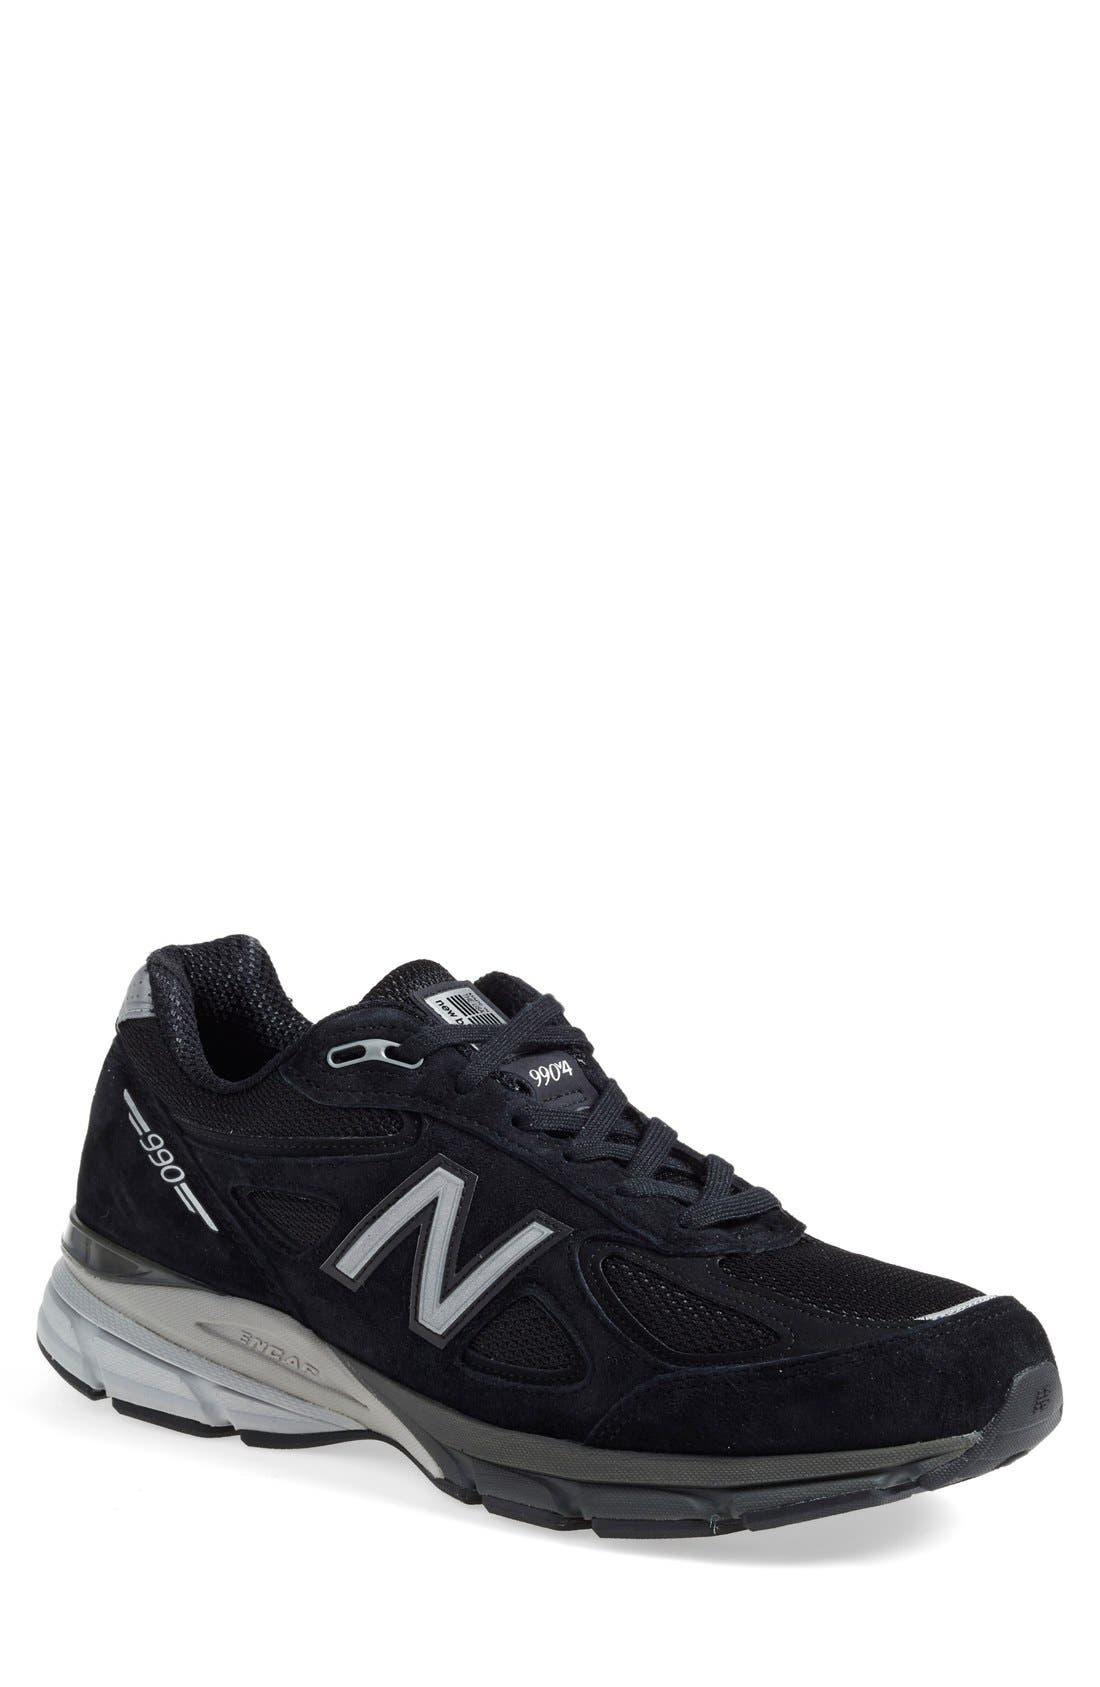 Alternate Image 1 Selected - New Balance '990' Running Shoe (Men)